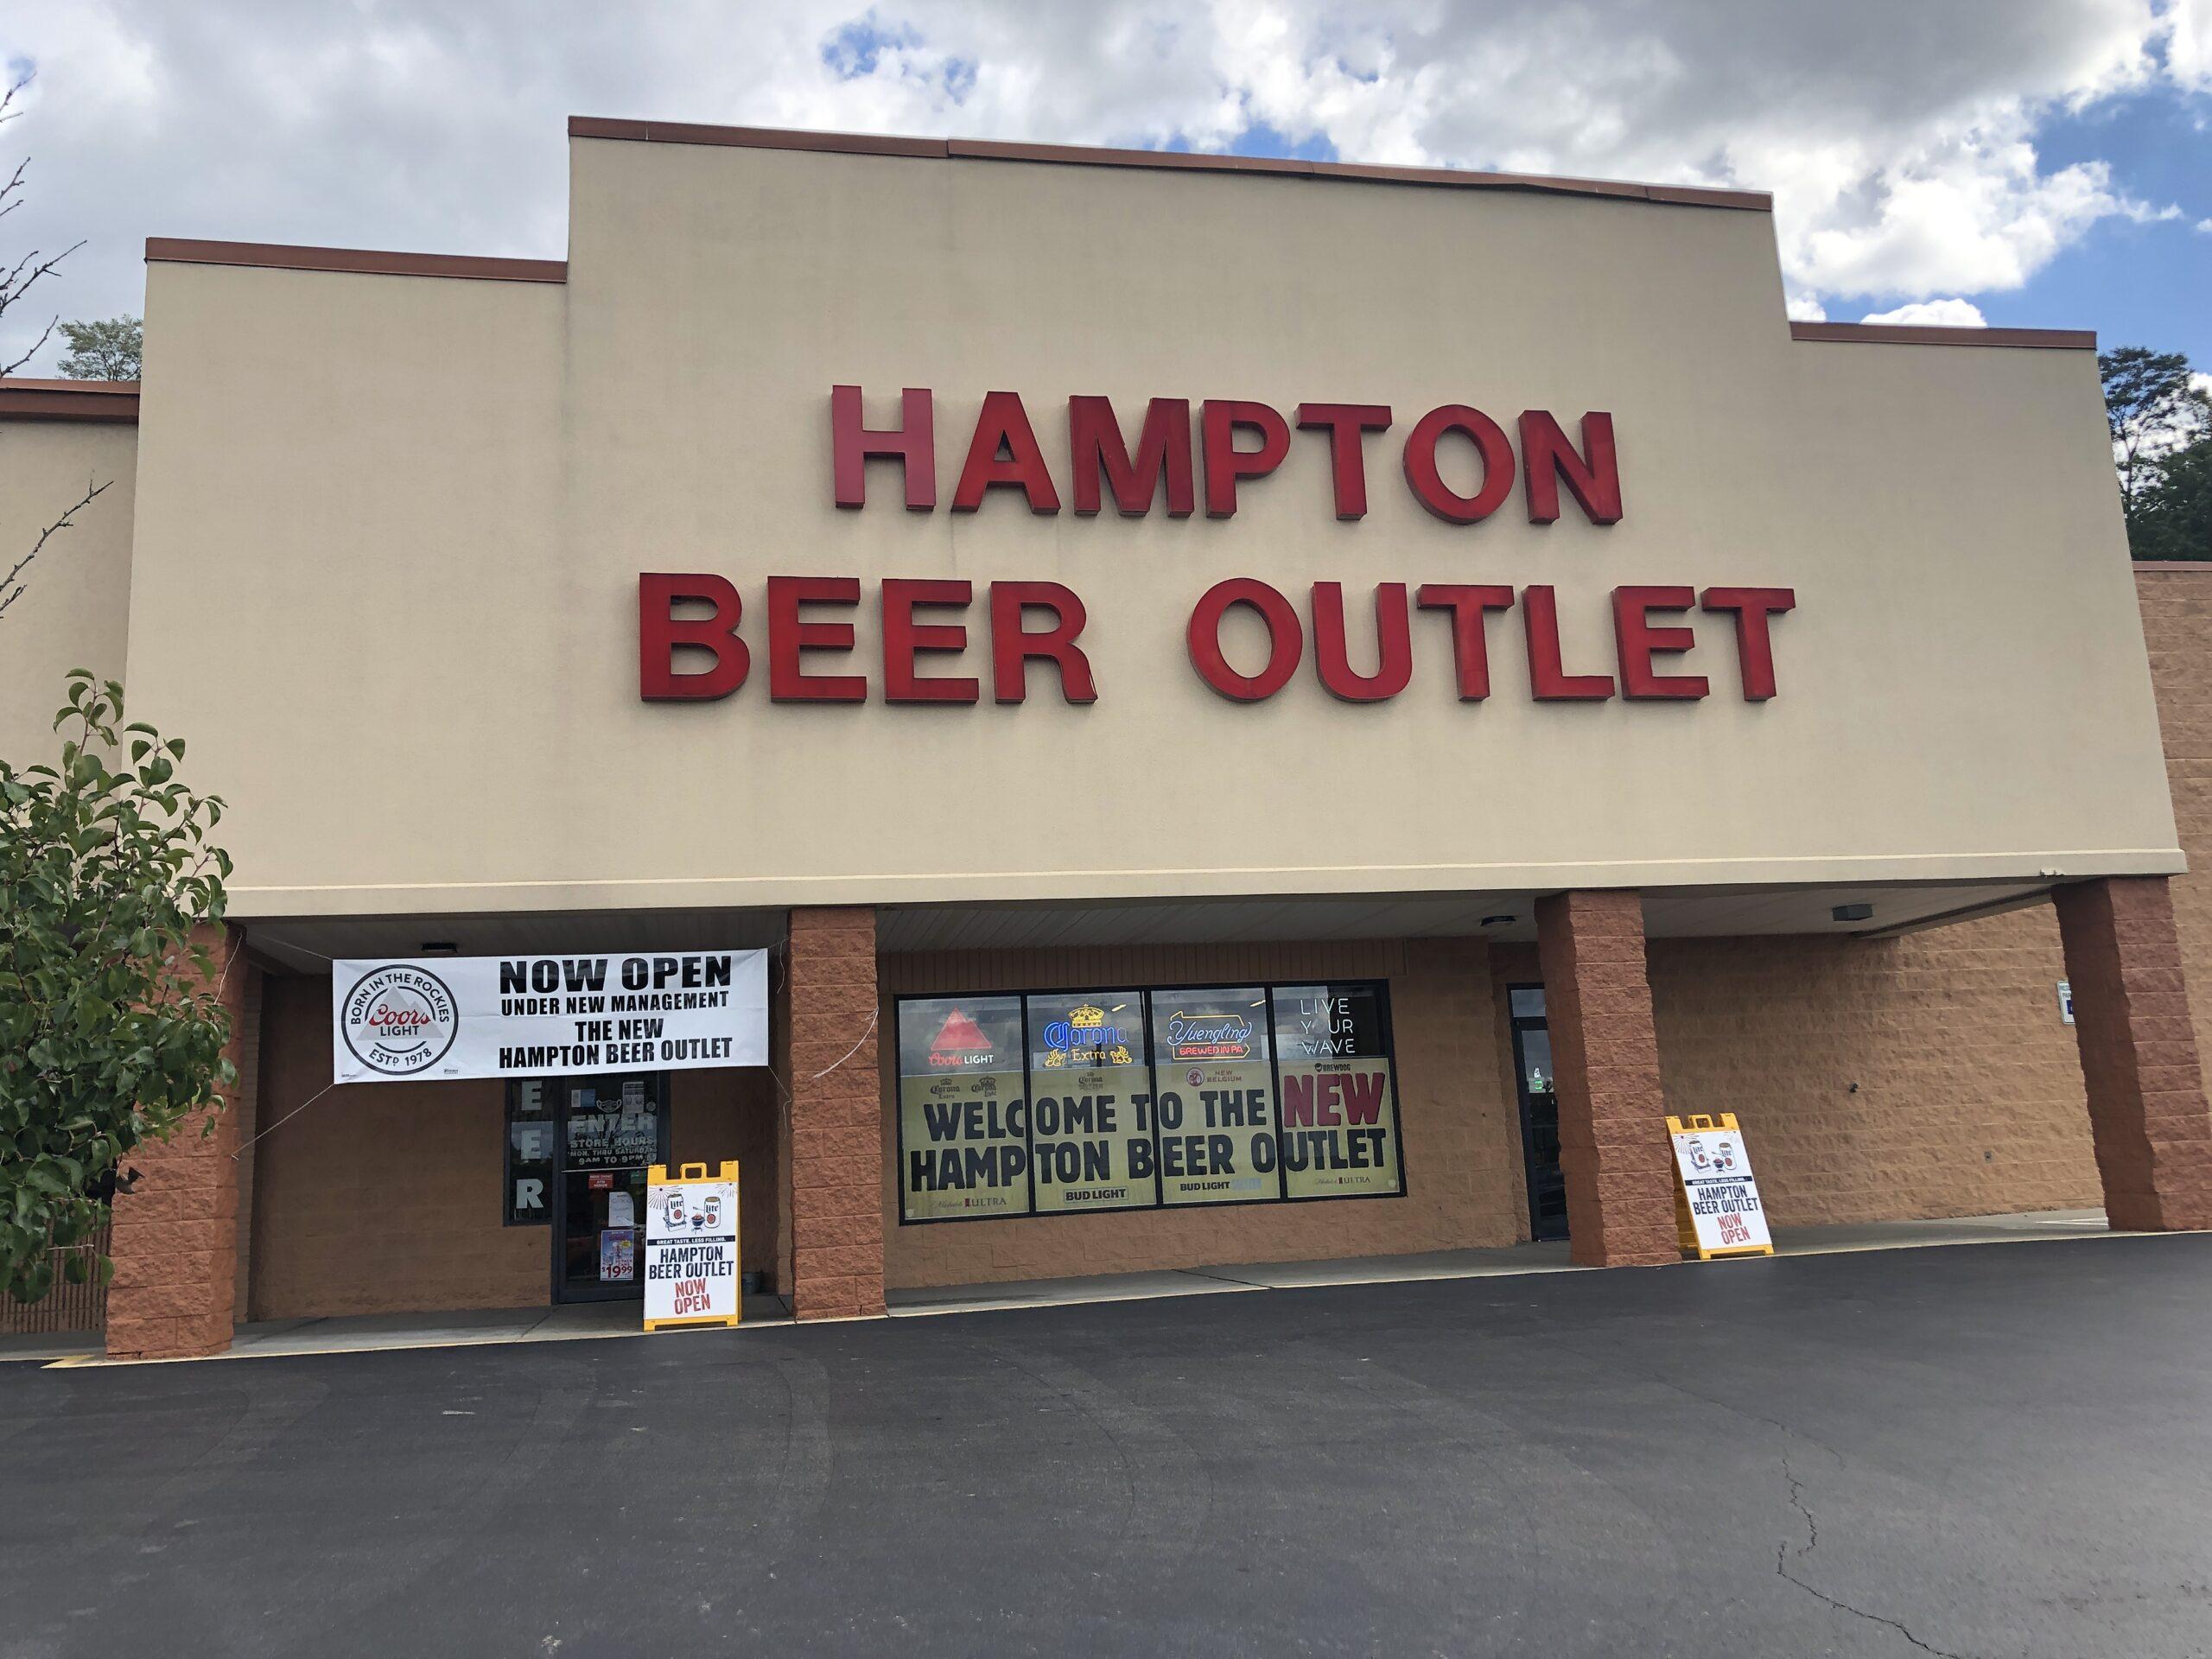 hampton-beer-outlet-front-exterior-pittsburgh-allison-park